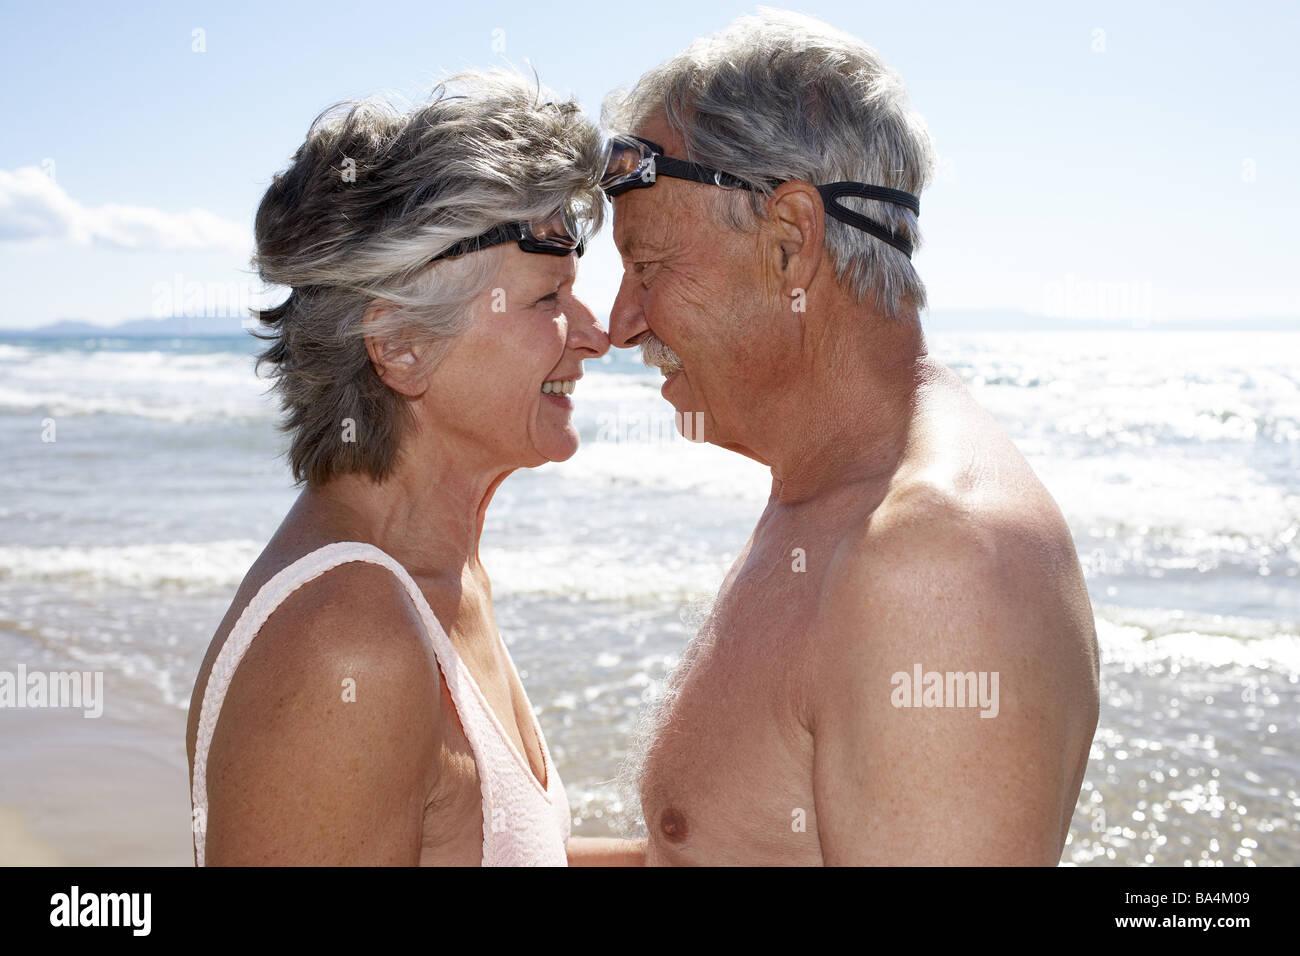 Beach senior-pair bath-clothing swimming-glasses gaze-contact smiles side-portrait back light series people seniors - Stock Image